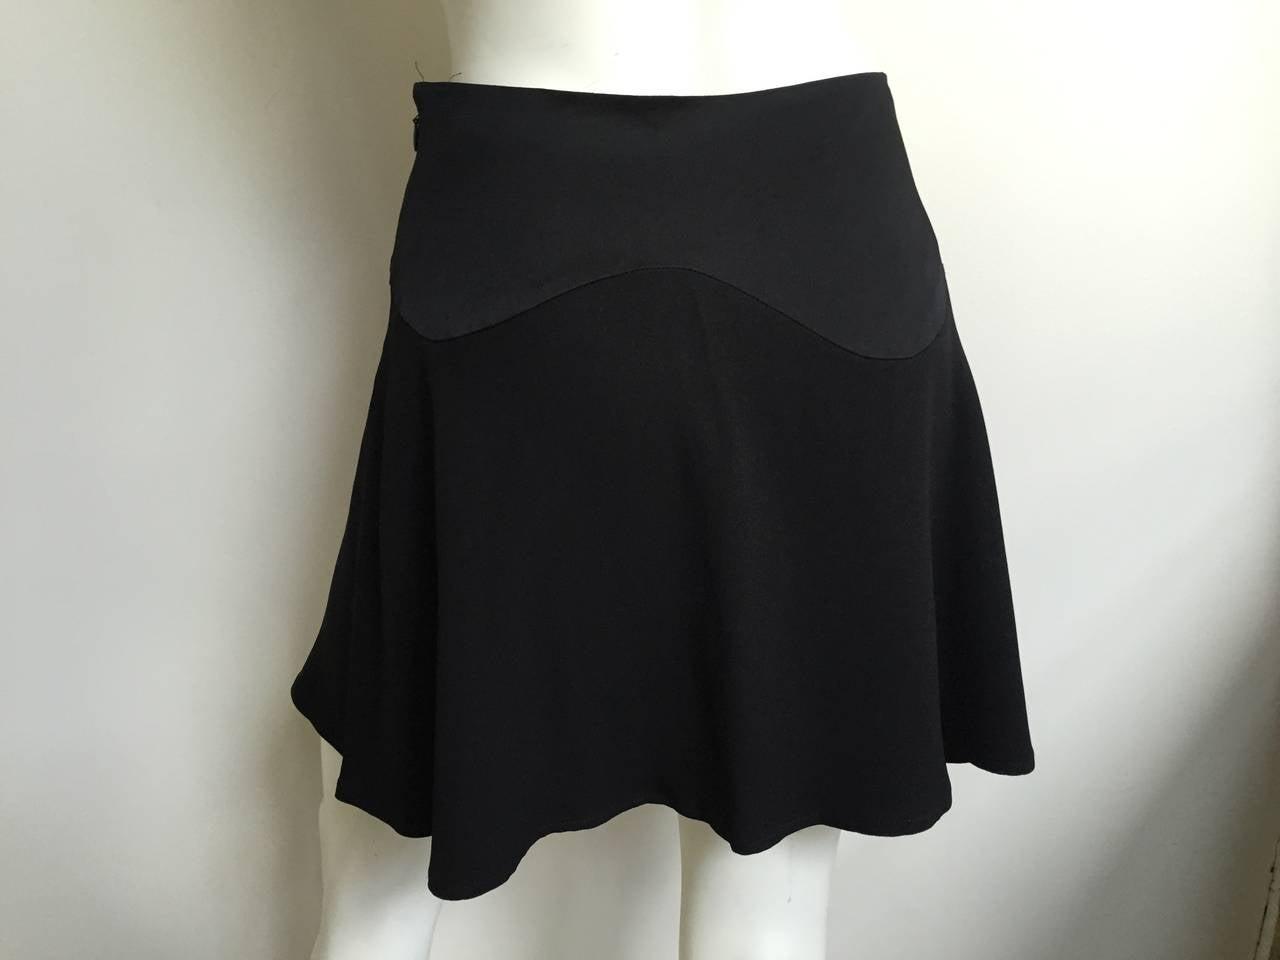 Moschino Black Short Skirt Size 6. 5